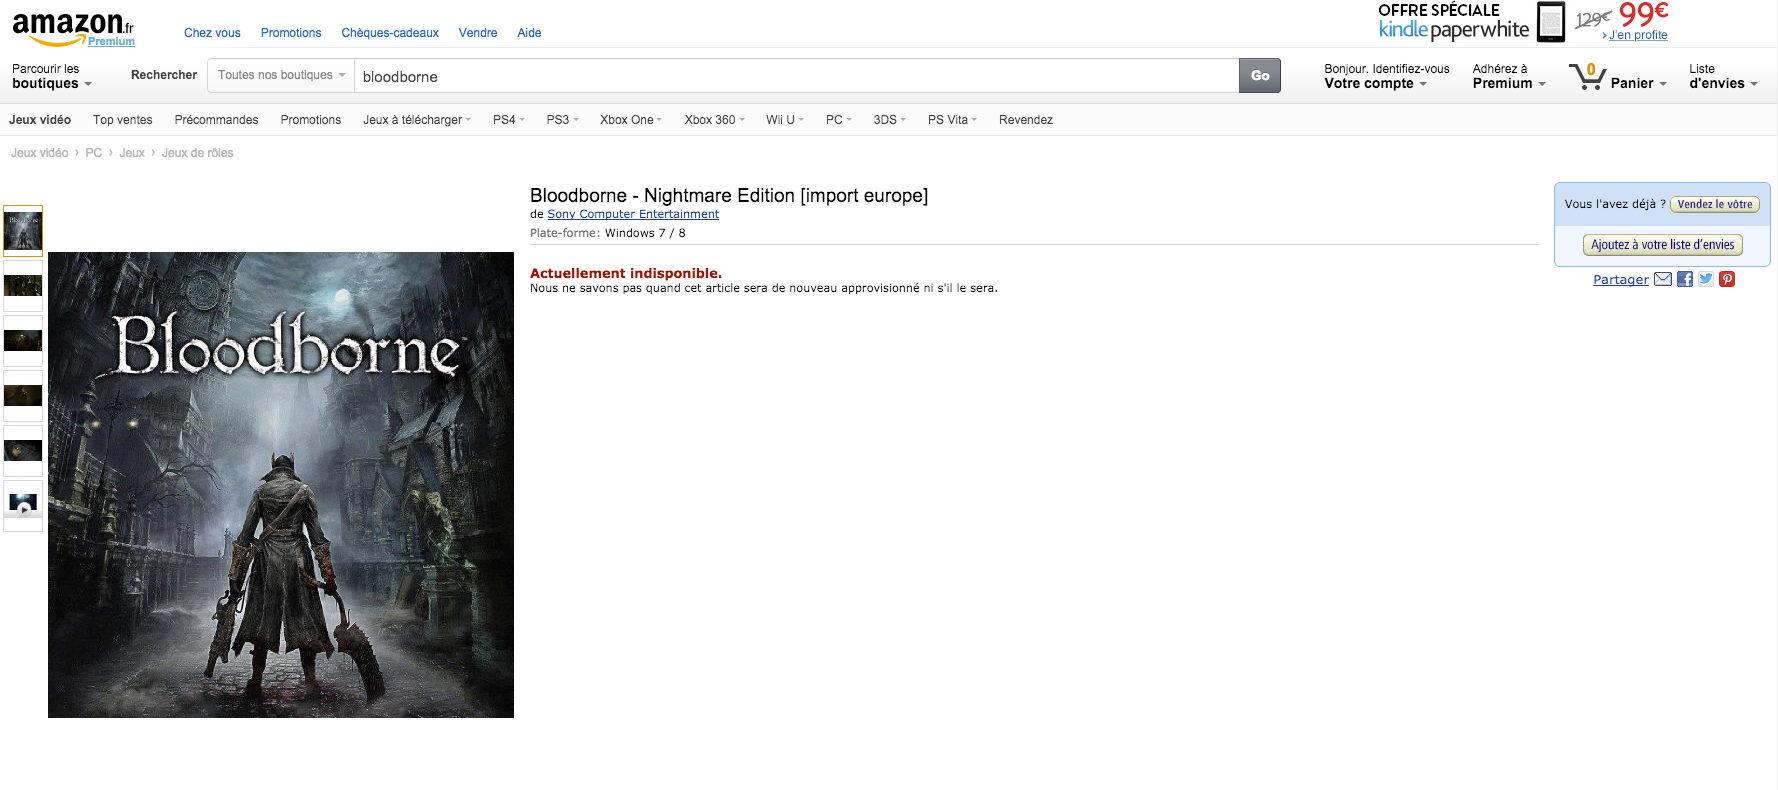 Bloodborne PC Amazon Listing